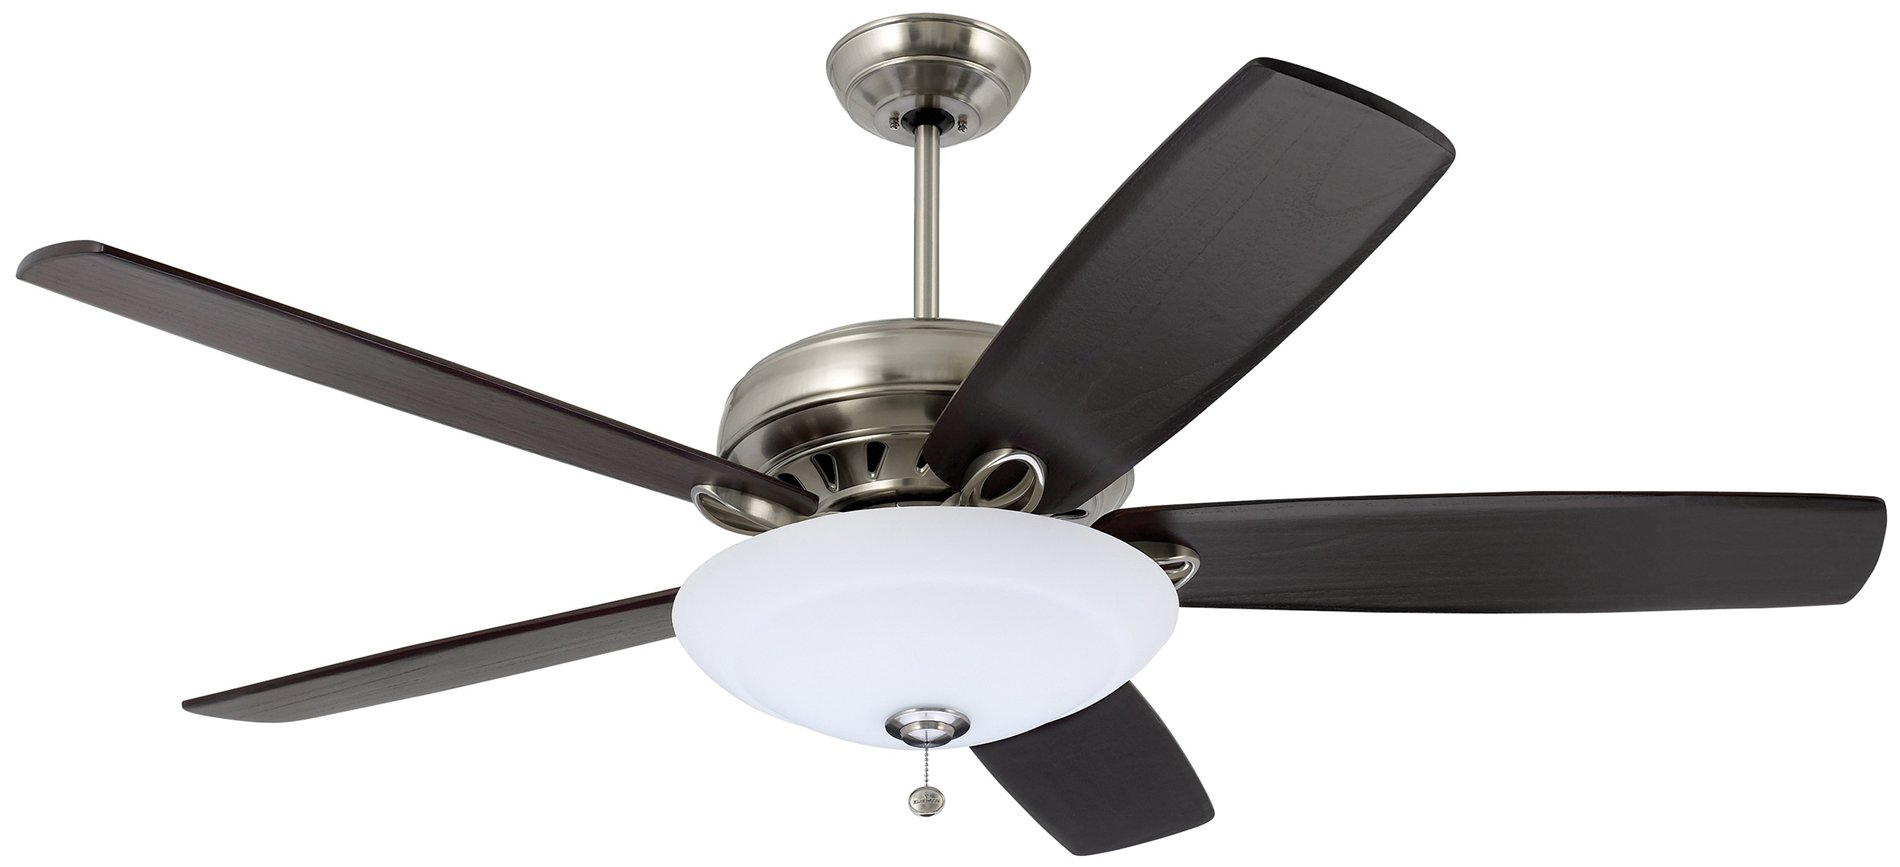 Emerson Cf5200bs Penbrooke Eco Transitional Ceiling Fan